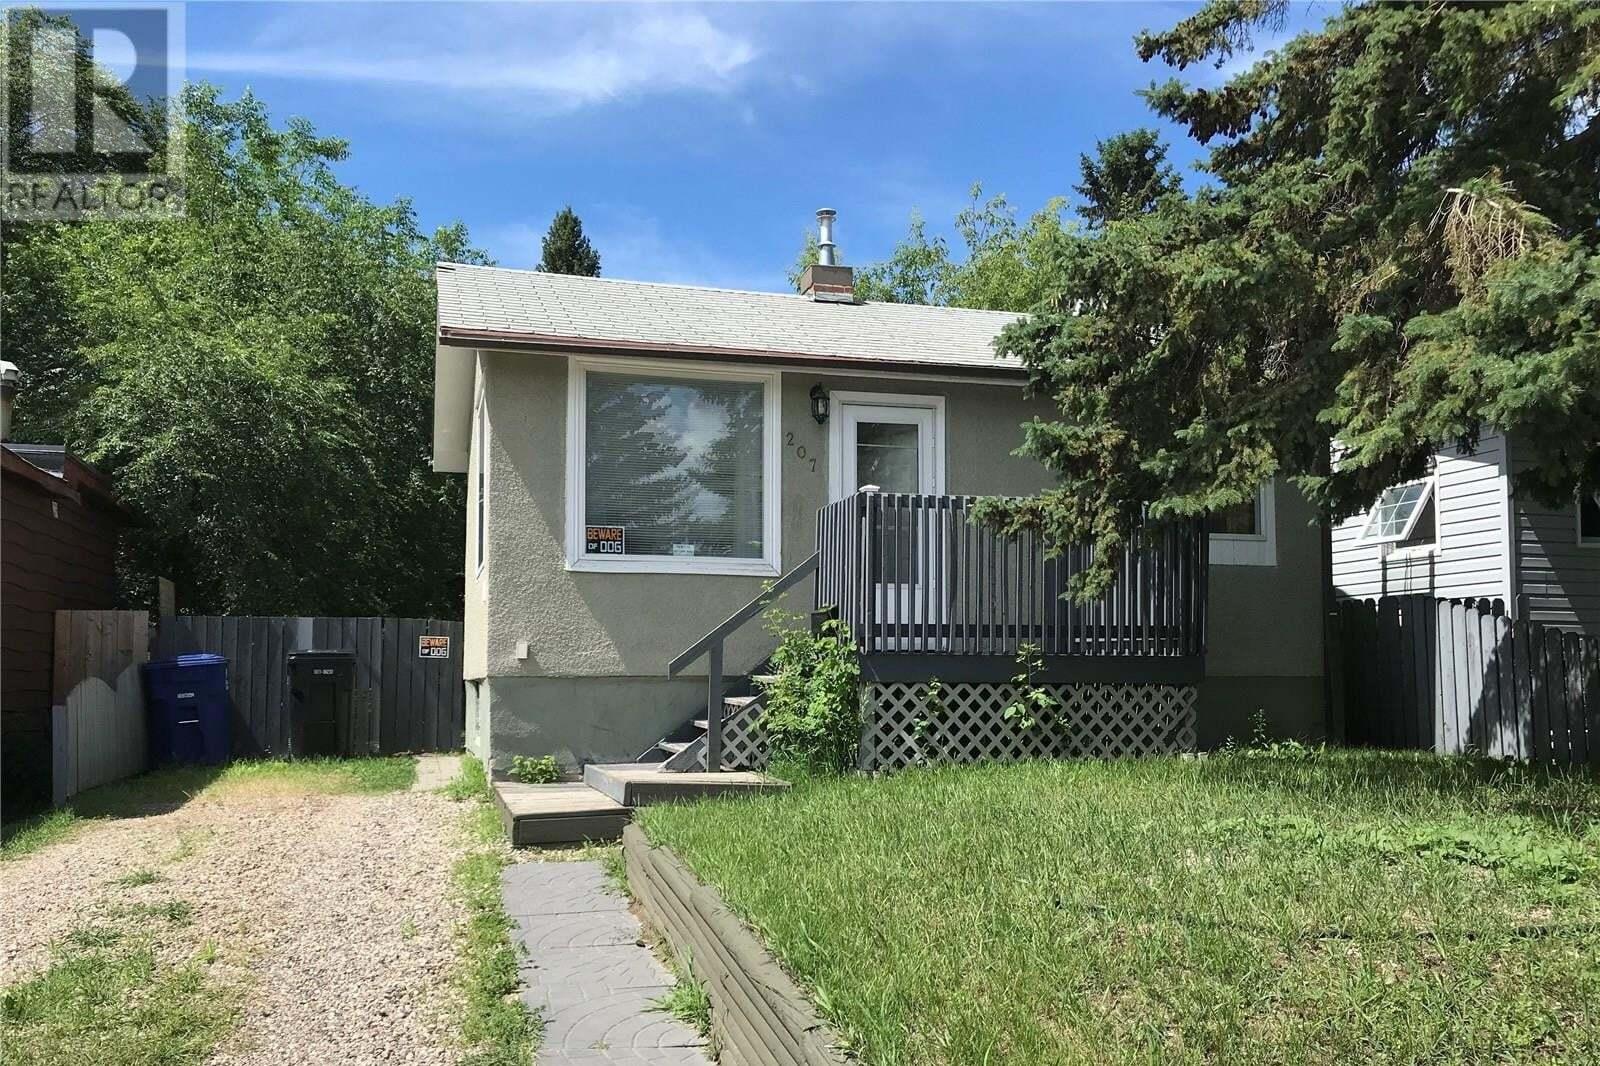 House for sale at 207 Y Ave S Saskatoon Saskatchewan - MLS: SK817284